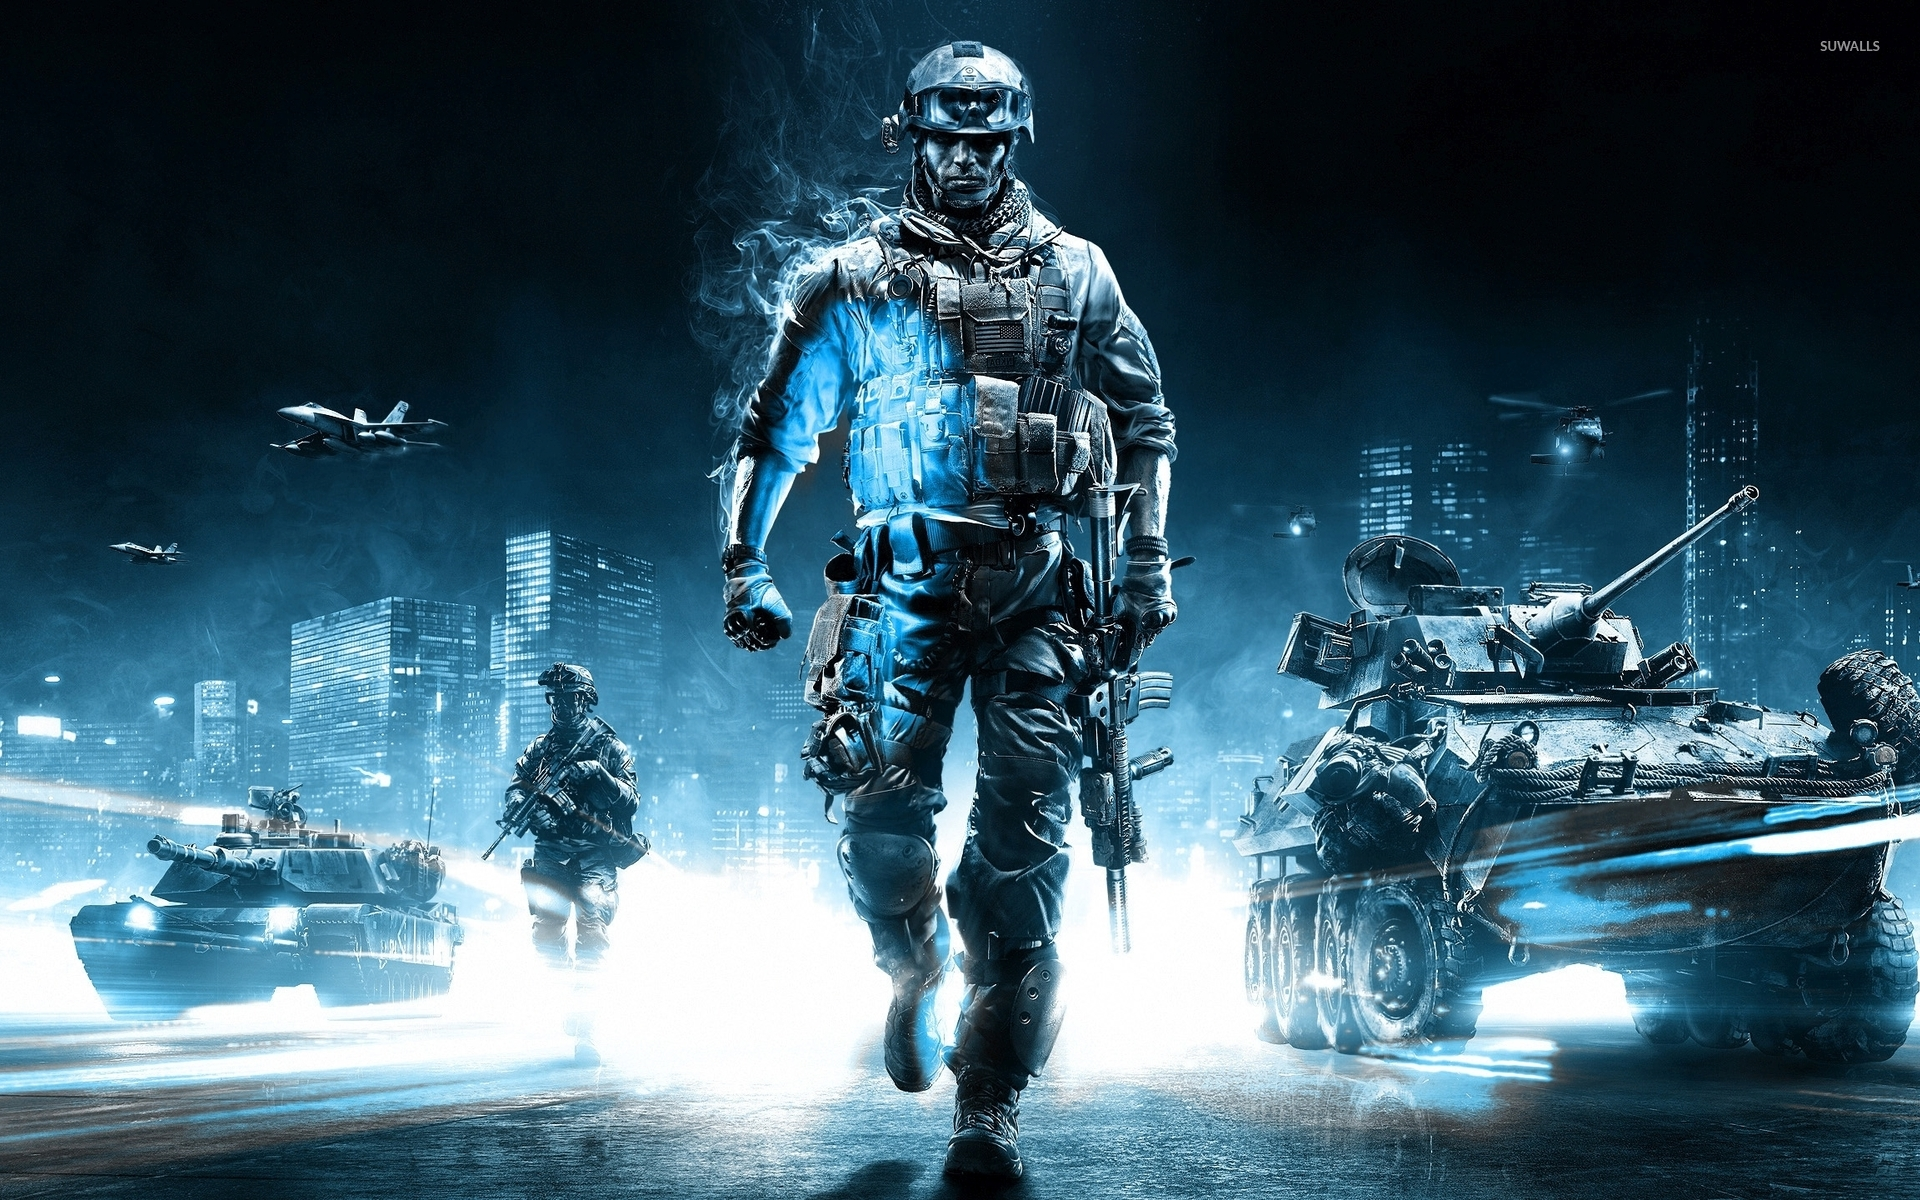 Battlefield 4 [19] wallpaper - Game wallpapers - #45531